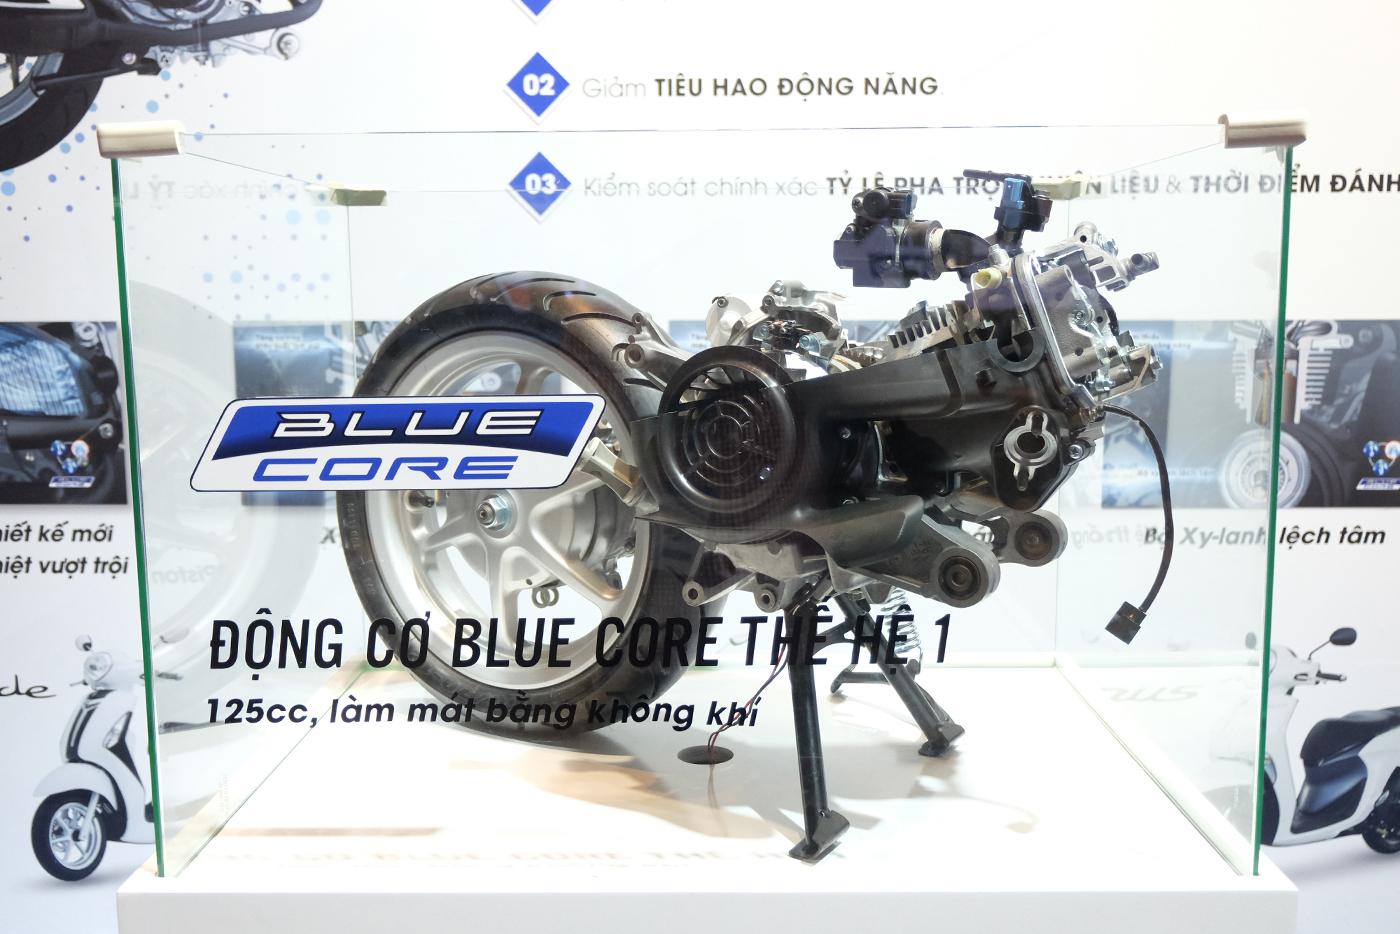 blue-core.jpg